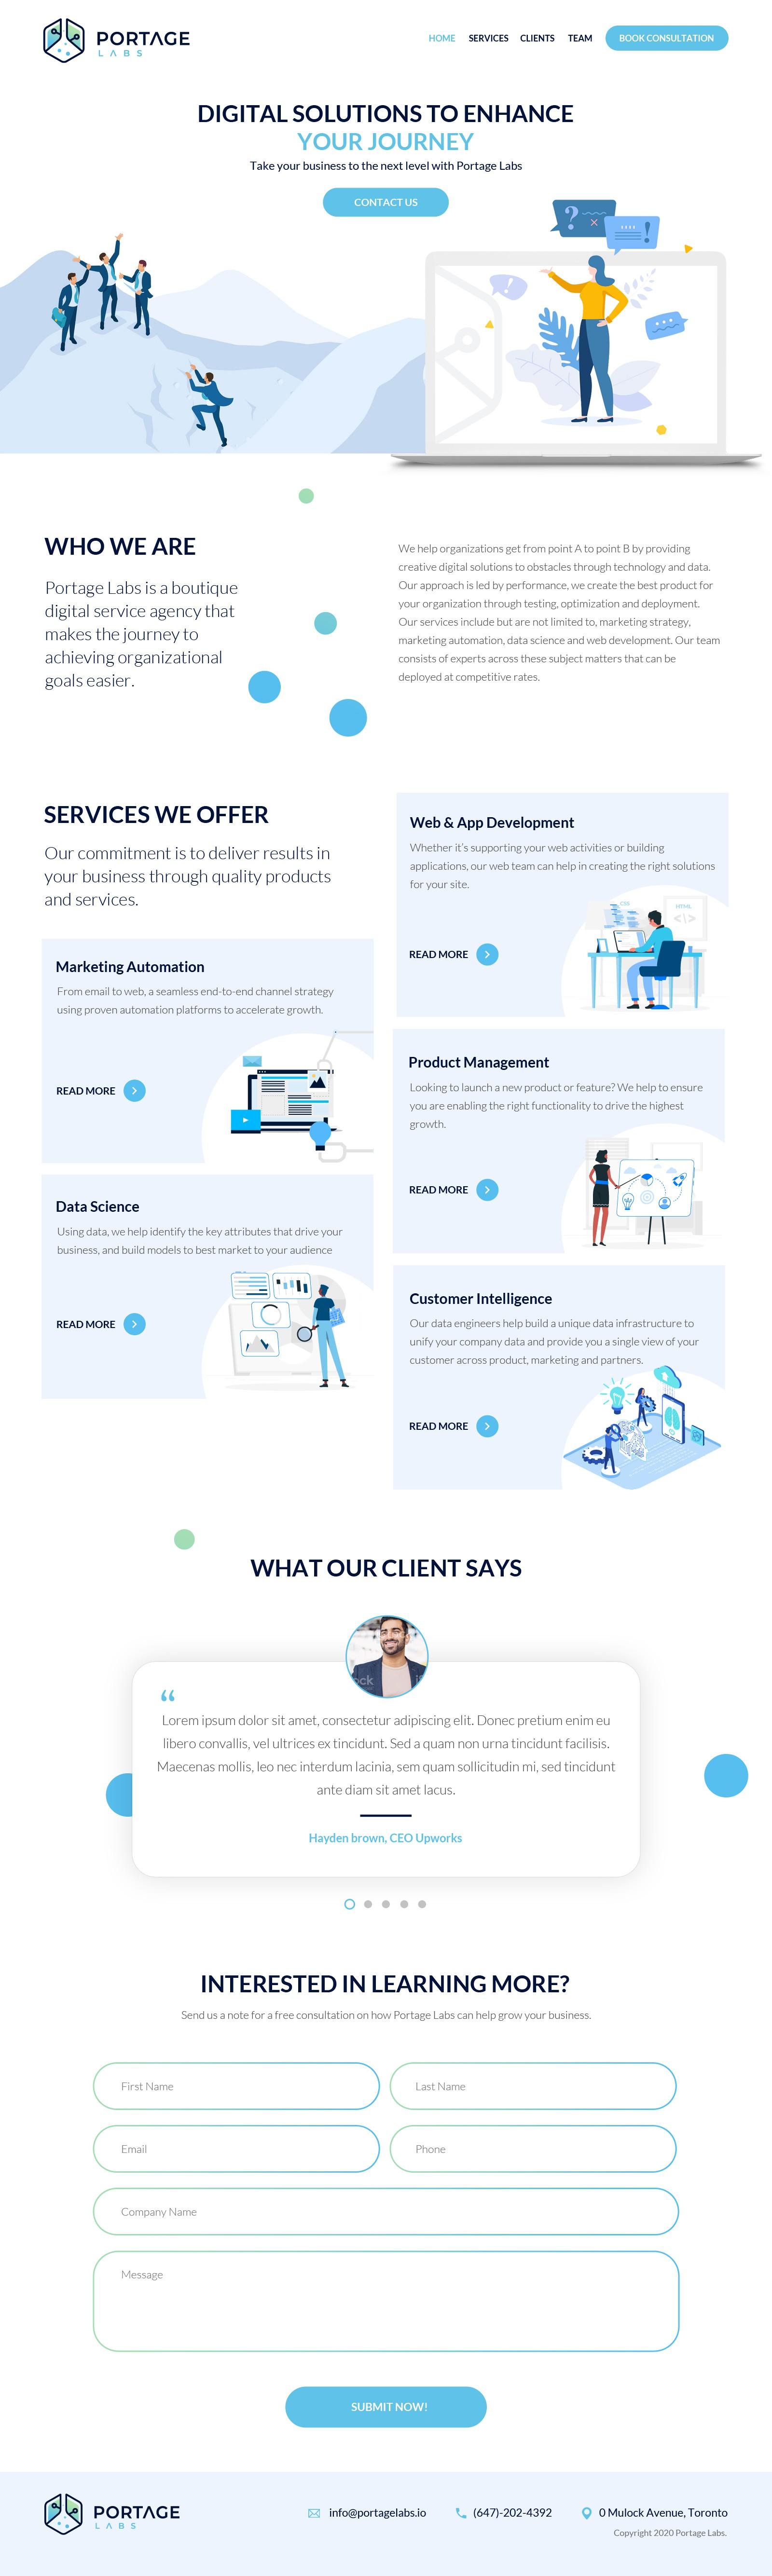 Design website for digital service consultancy